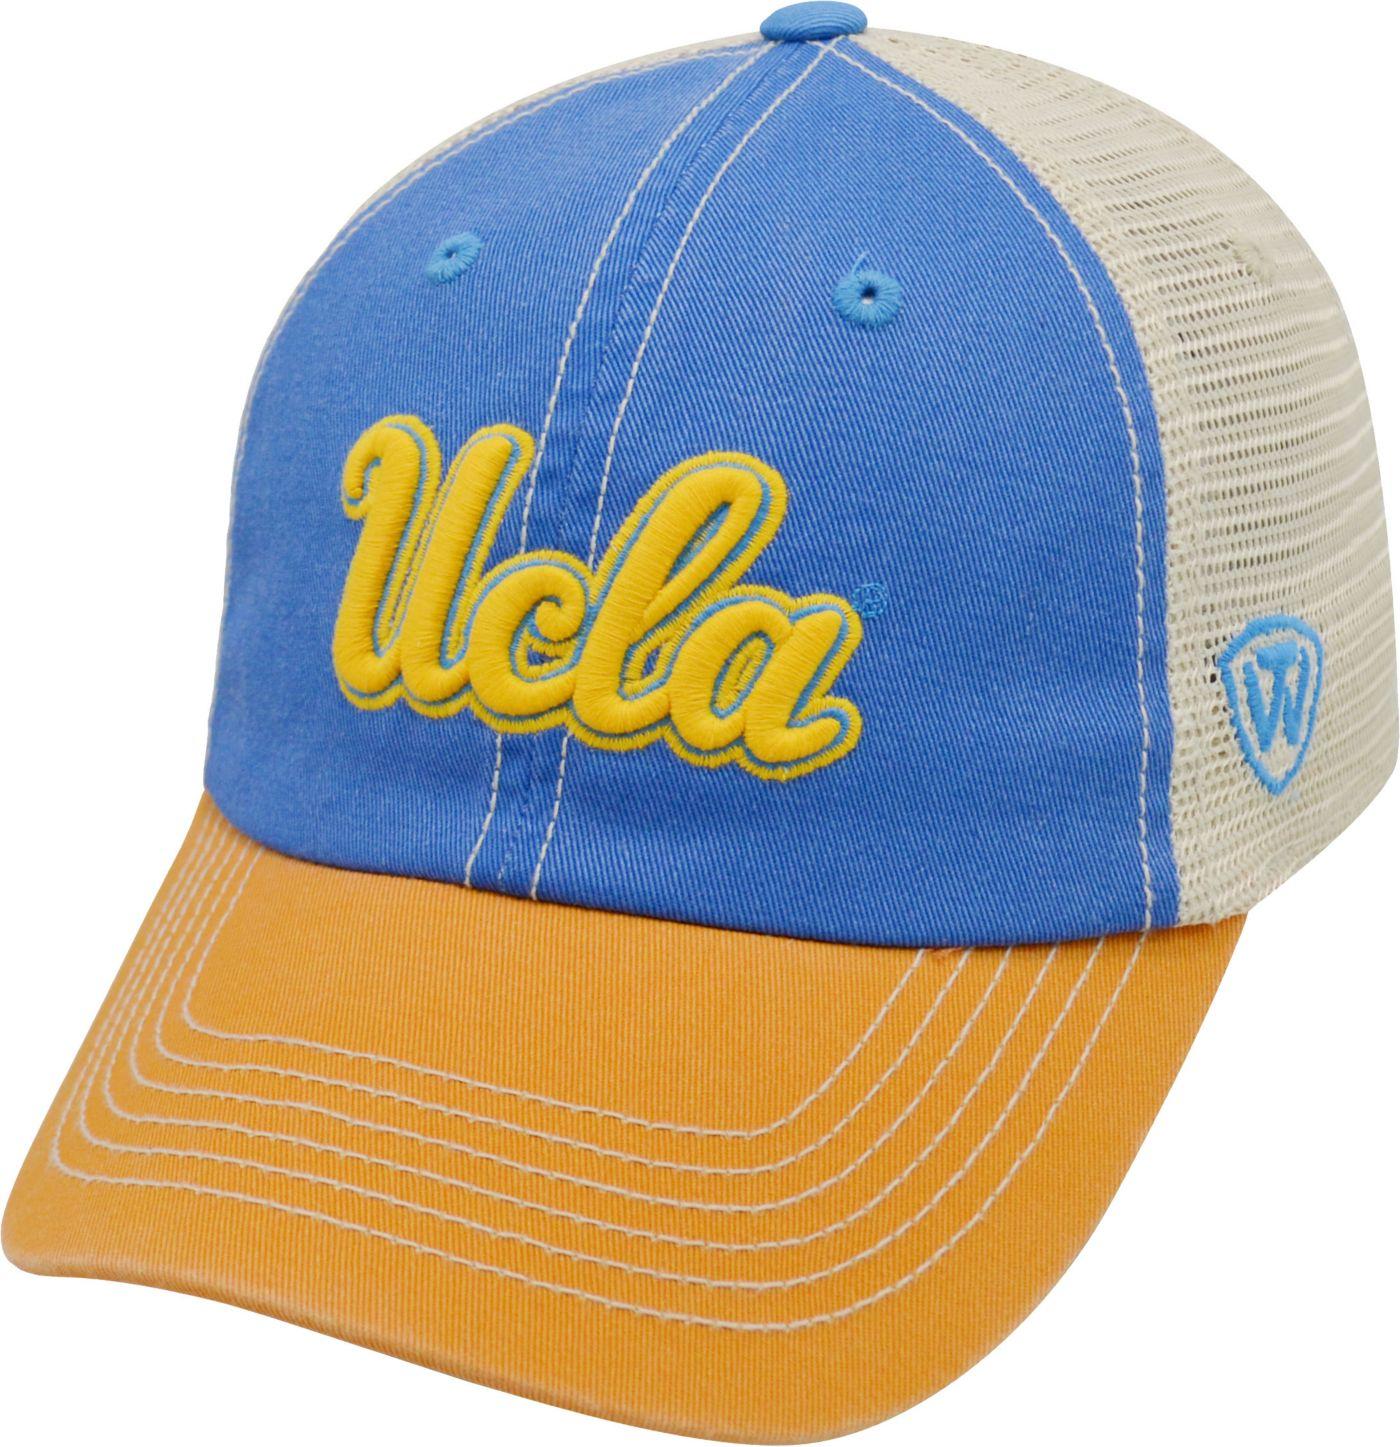 Top of the World Men's UCLA Bruins True Blue/White/Gold Off Road Adjustable Hat